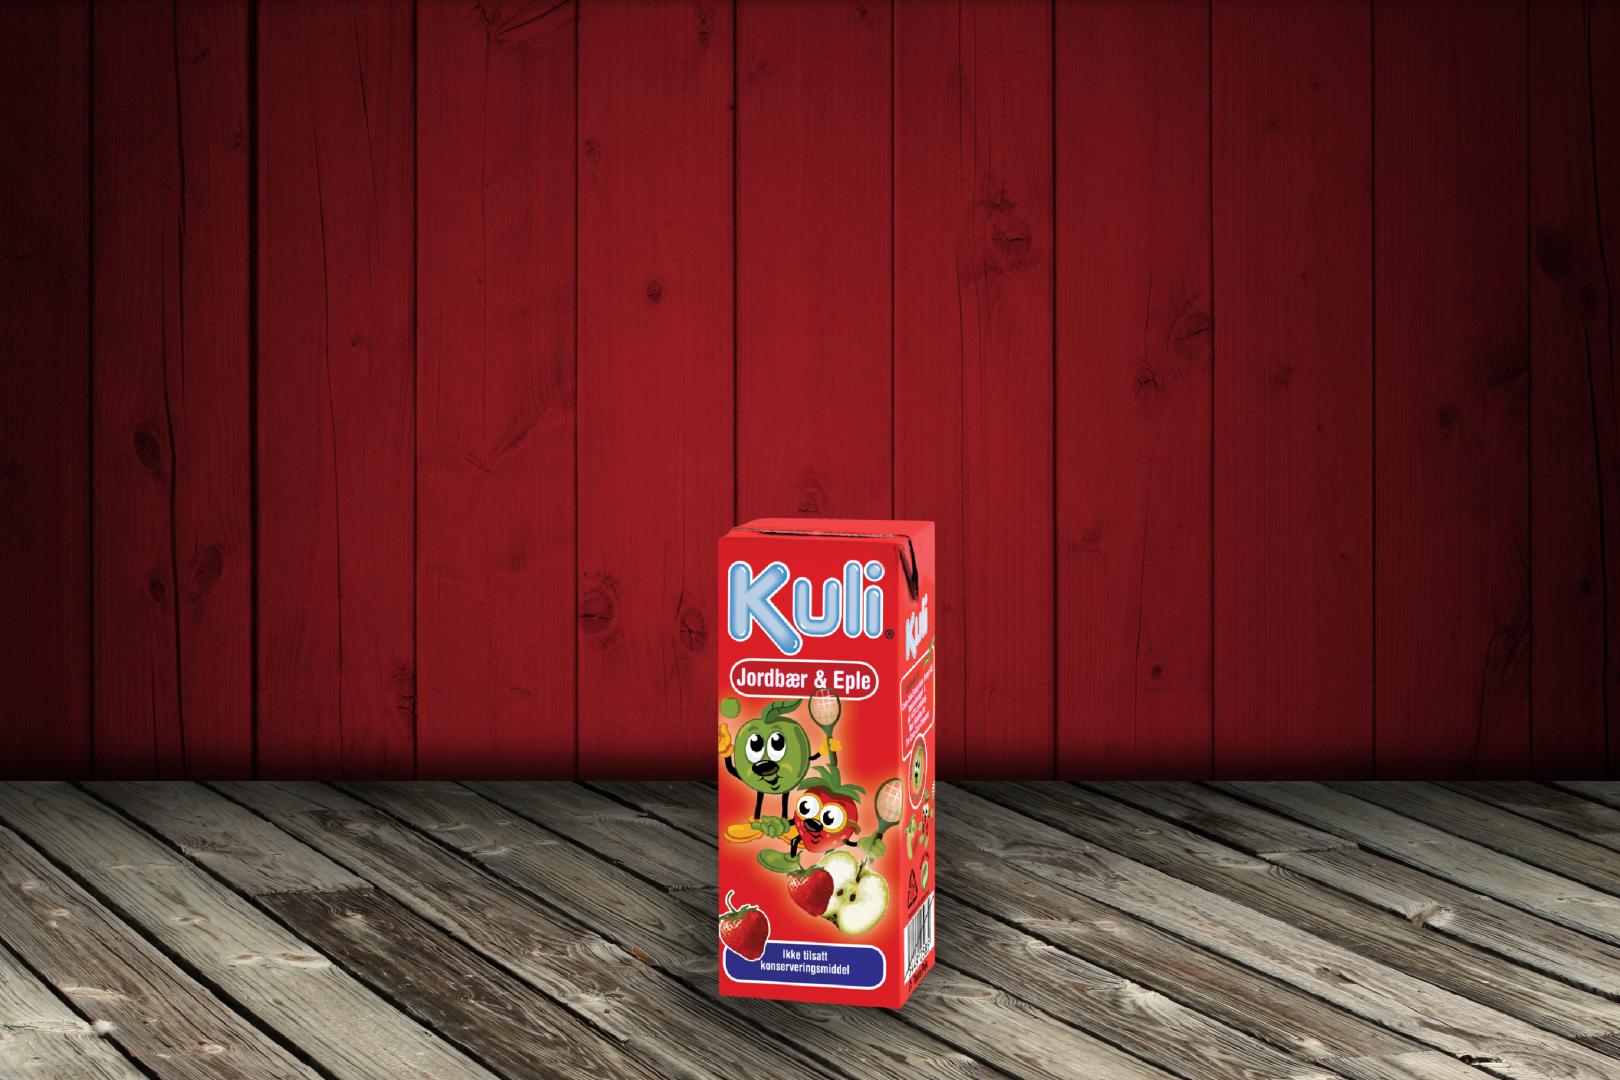 Kuli Jordbær & Eple 0.2L